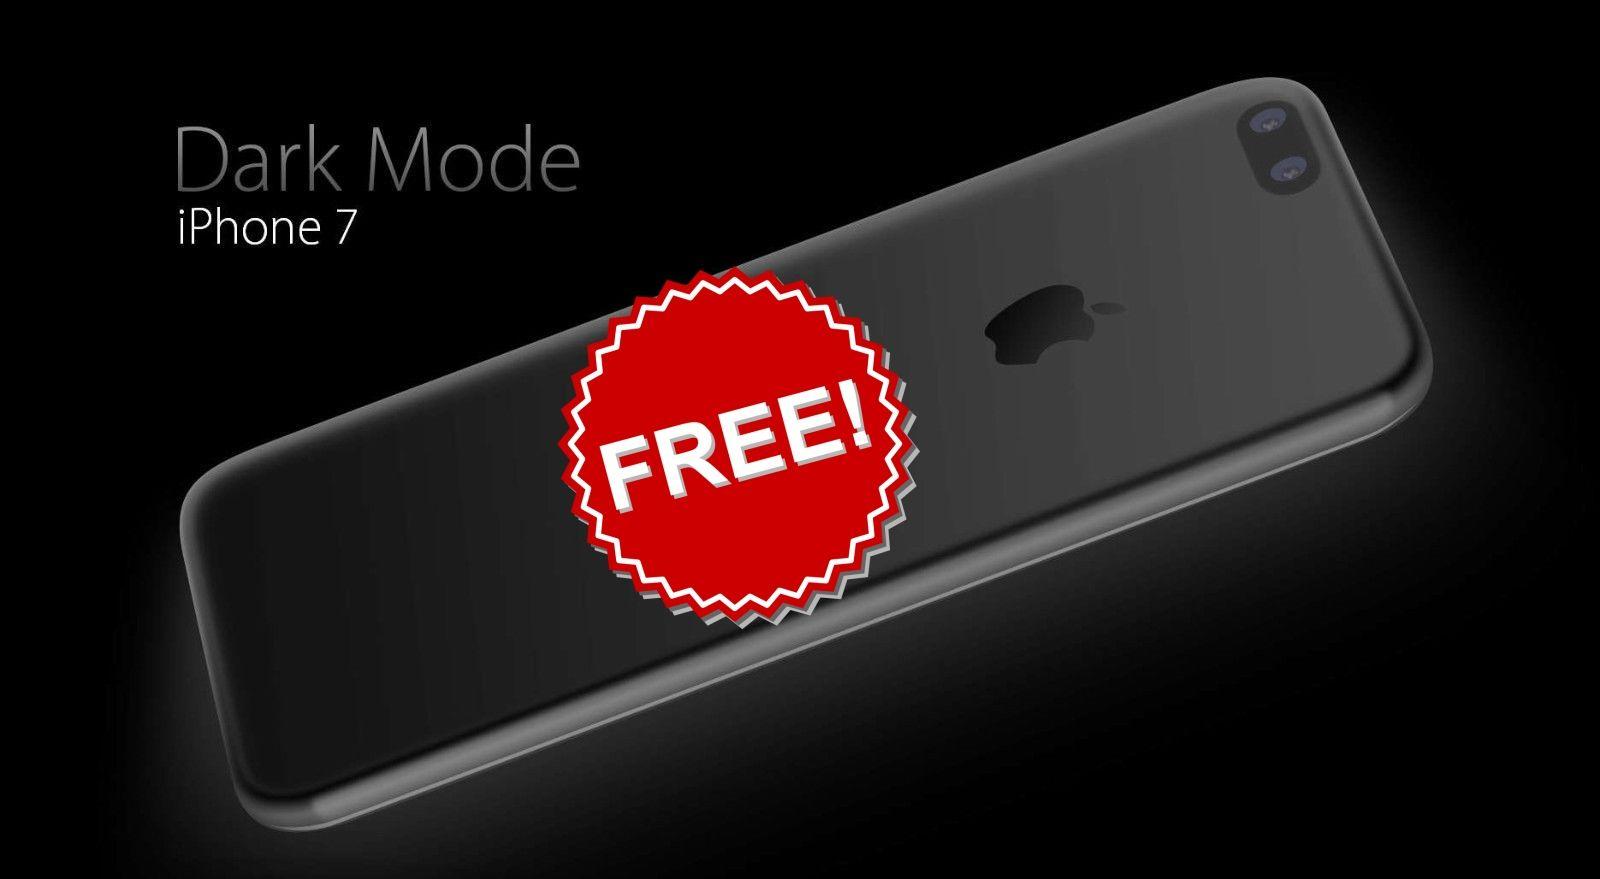 86252c66ce43a8 Win iPhone 7 32GB Unlocked Matte Black Giveaway. International. Link in my  profile's info. #giveaway #iphone #iphone7 #international #apple #32gb  #Unlocked ...